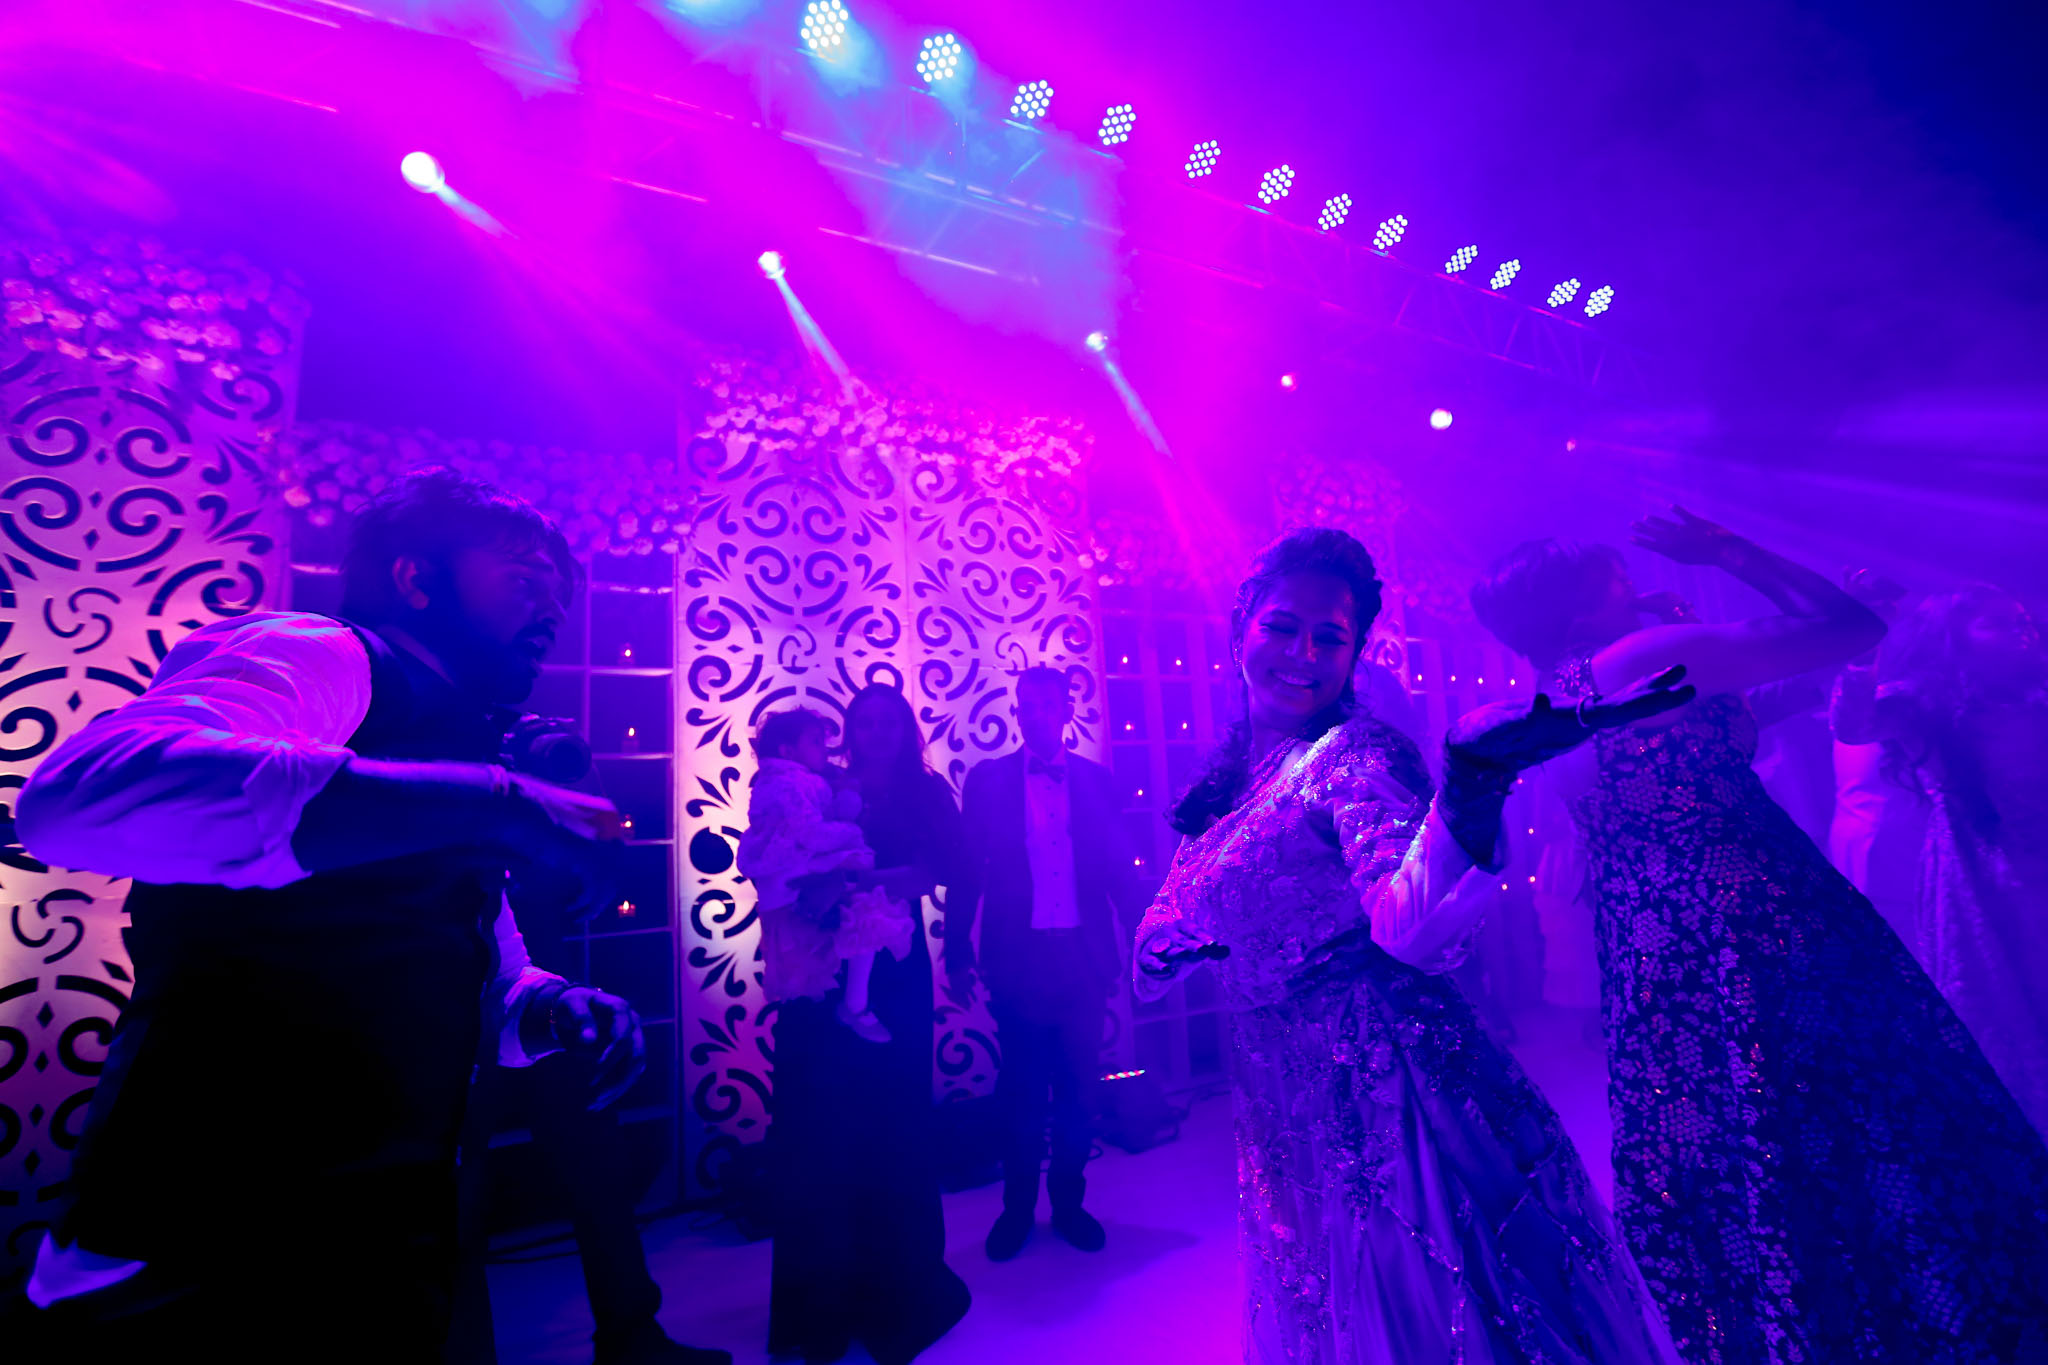 Mukti x Ojas Wedding Akshjay Sansare Photography Best wedding photographer in mumbai India Candid Cinematic Films videos-21.jpg